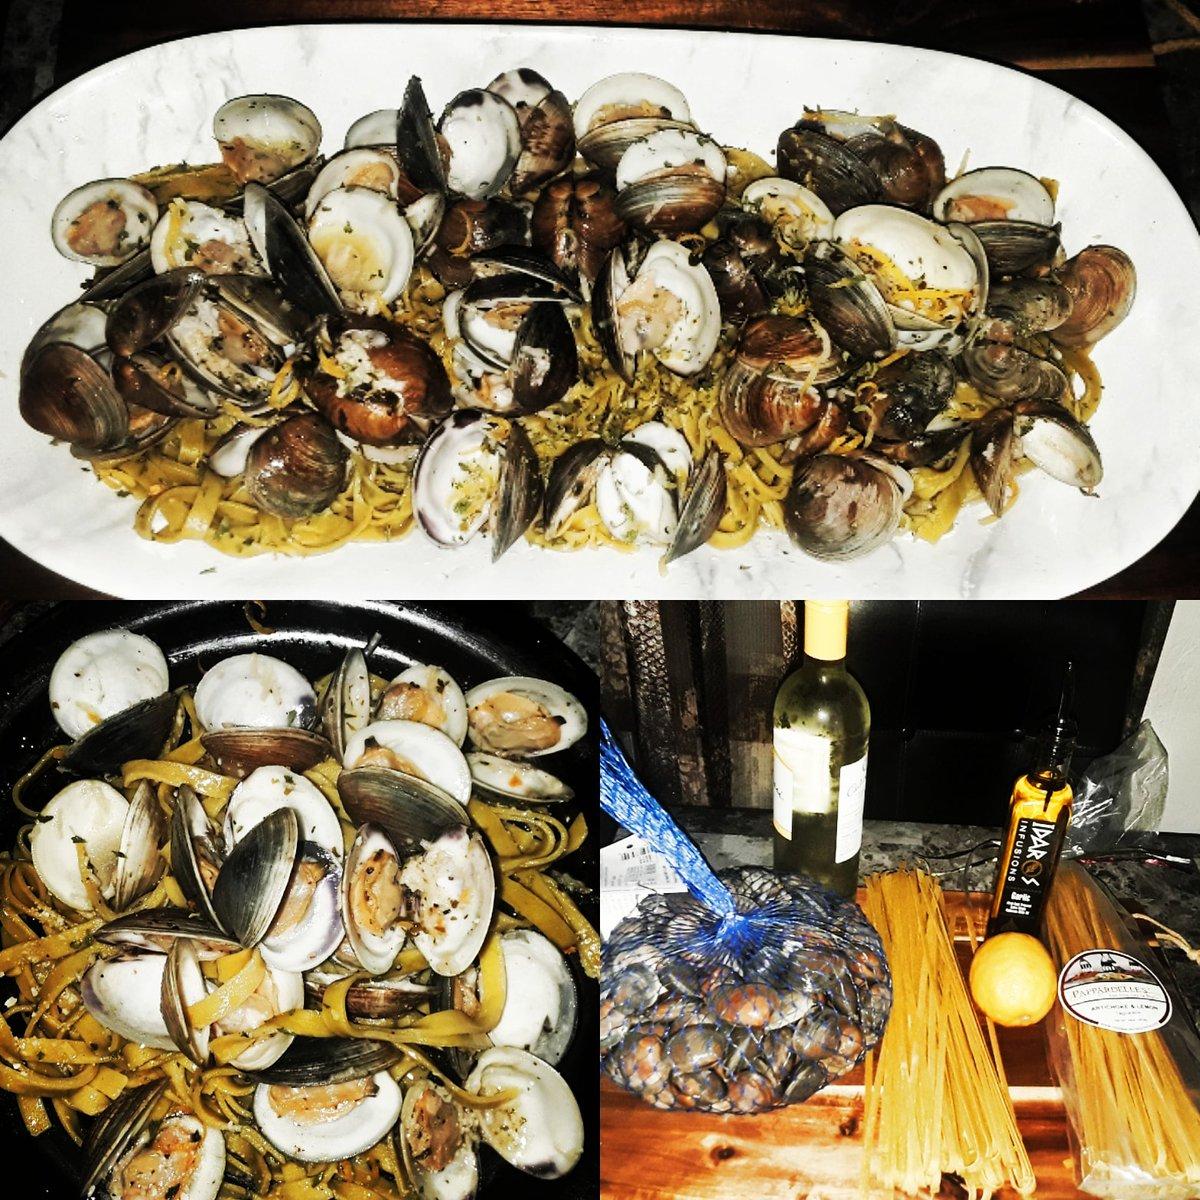 Artichoke & Lemon Tagliatelle with Clams in a Citrus Sangria Garlic Sauce.. oh Heaven on a Fork!!! #summertime #summerfood #sangria #tagliatelle #pasta #cheflife #chefsofinstagram #foodandwine #clams #seafood #italy#greece🇬🇷 #fresh #favorite ##lemon #artichoke #oliveoil  #idaros https://t.co/e1hMlgVFGo